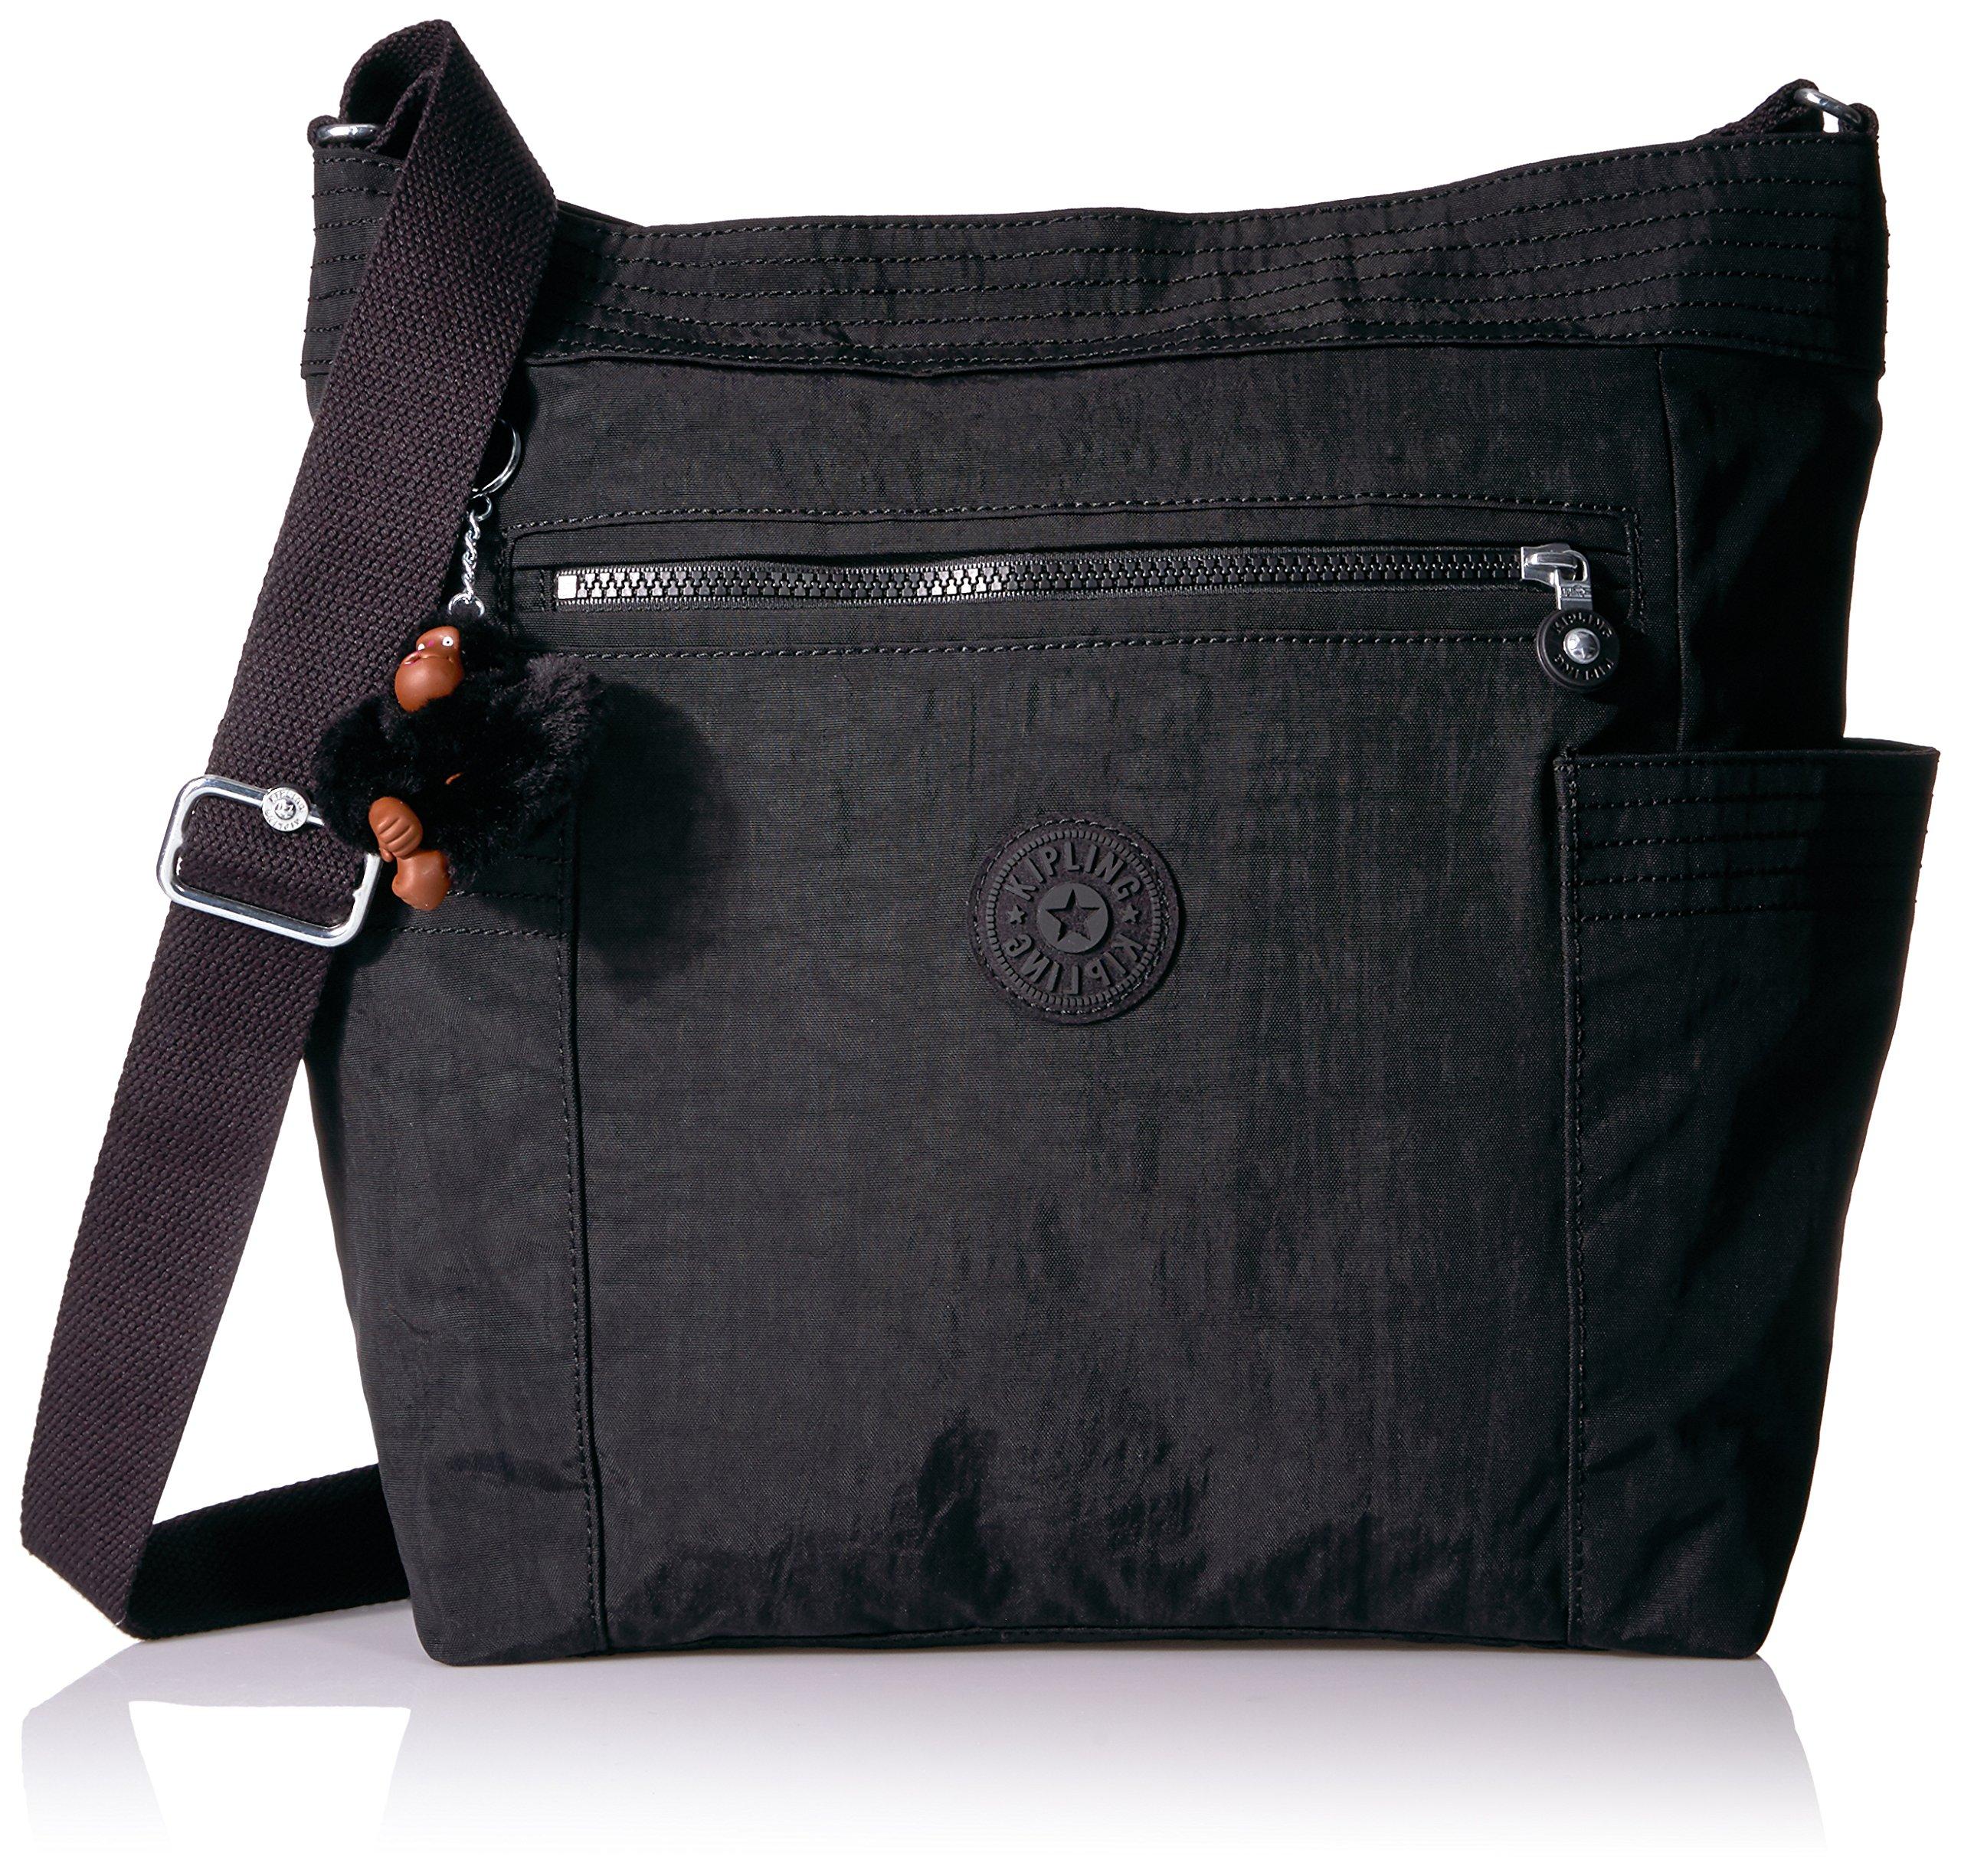 Kipling Melvin Solid Hobo Crossbody Bag